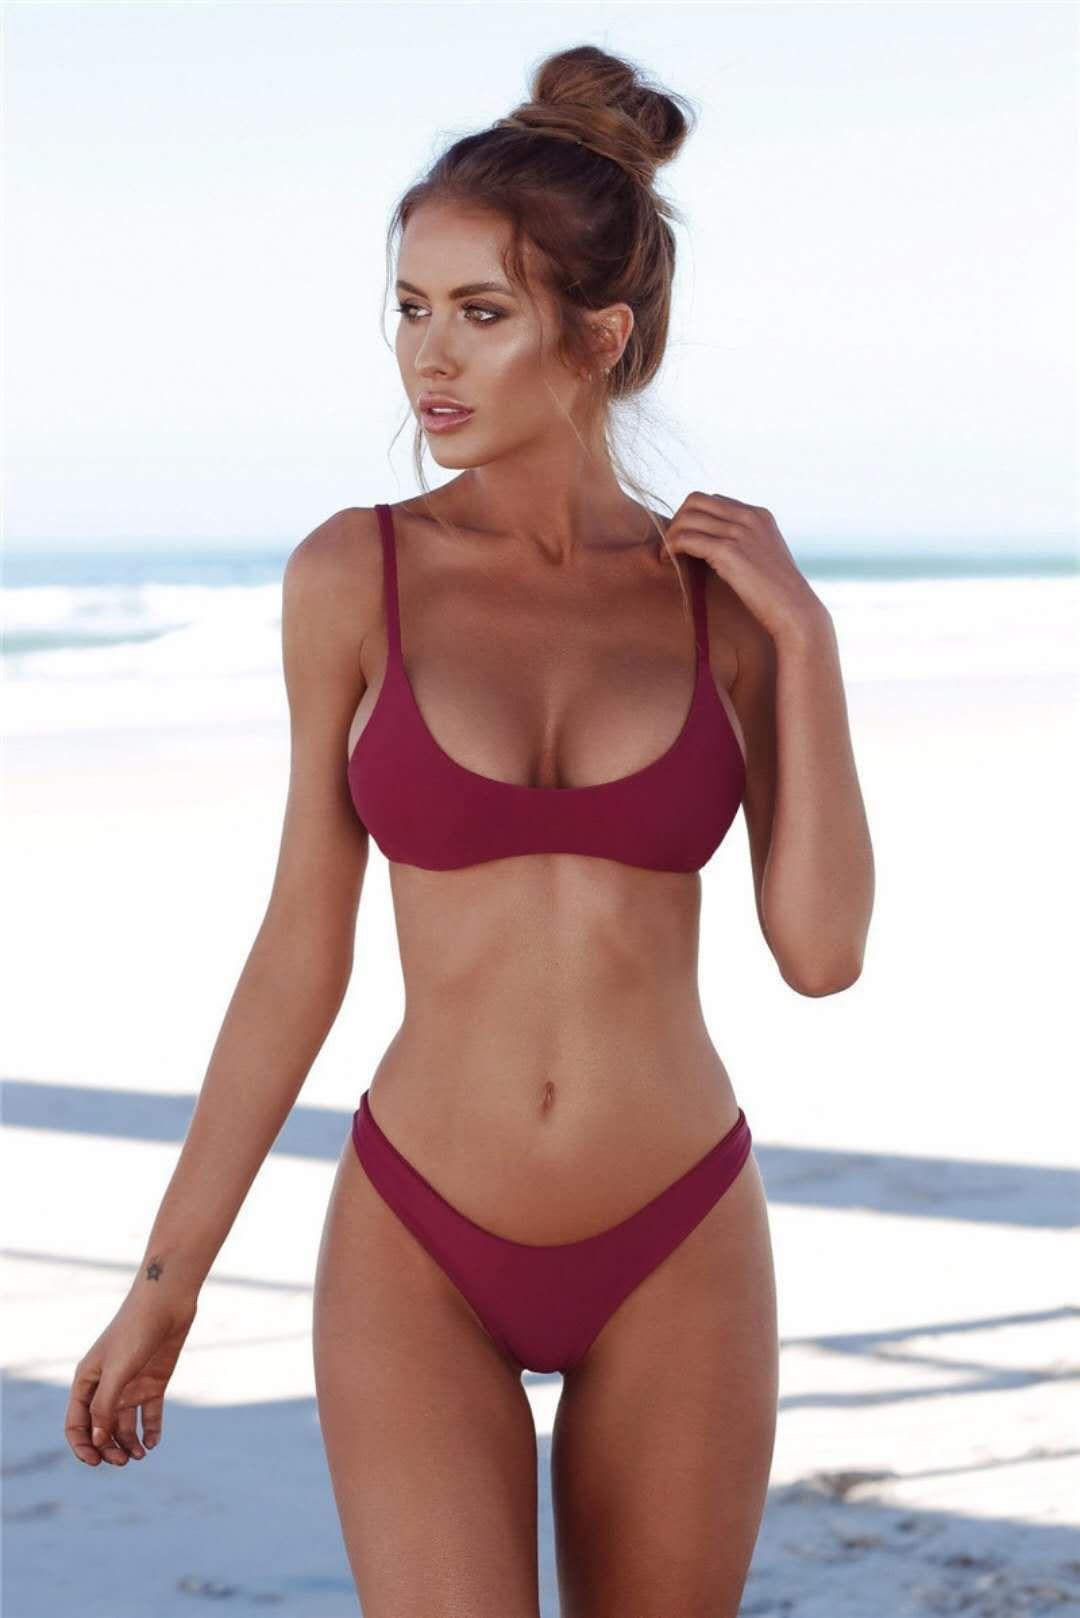 Hot and sexy bikini